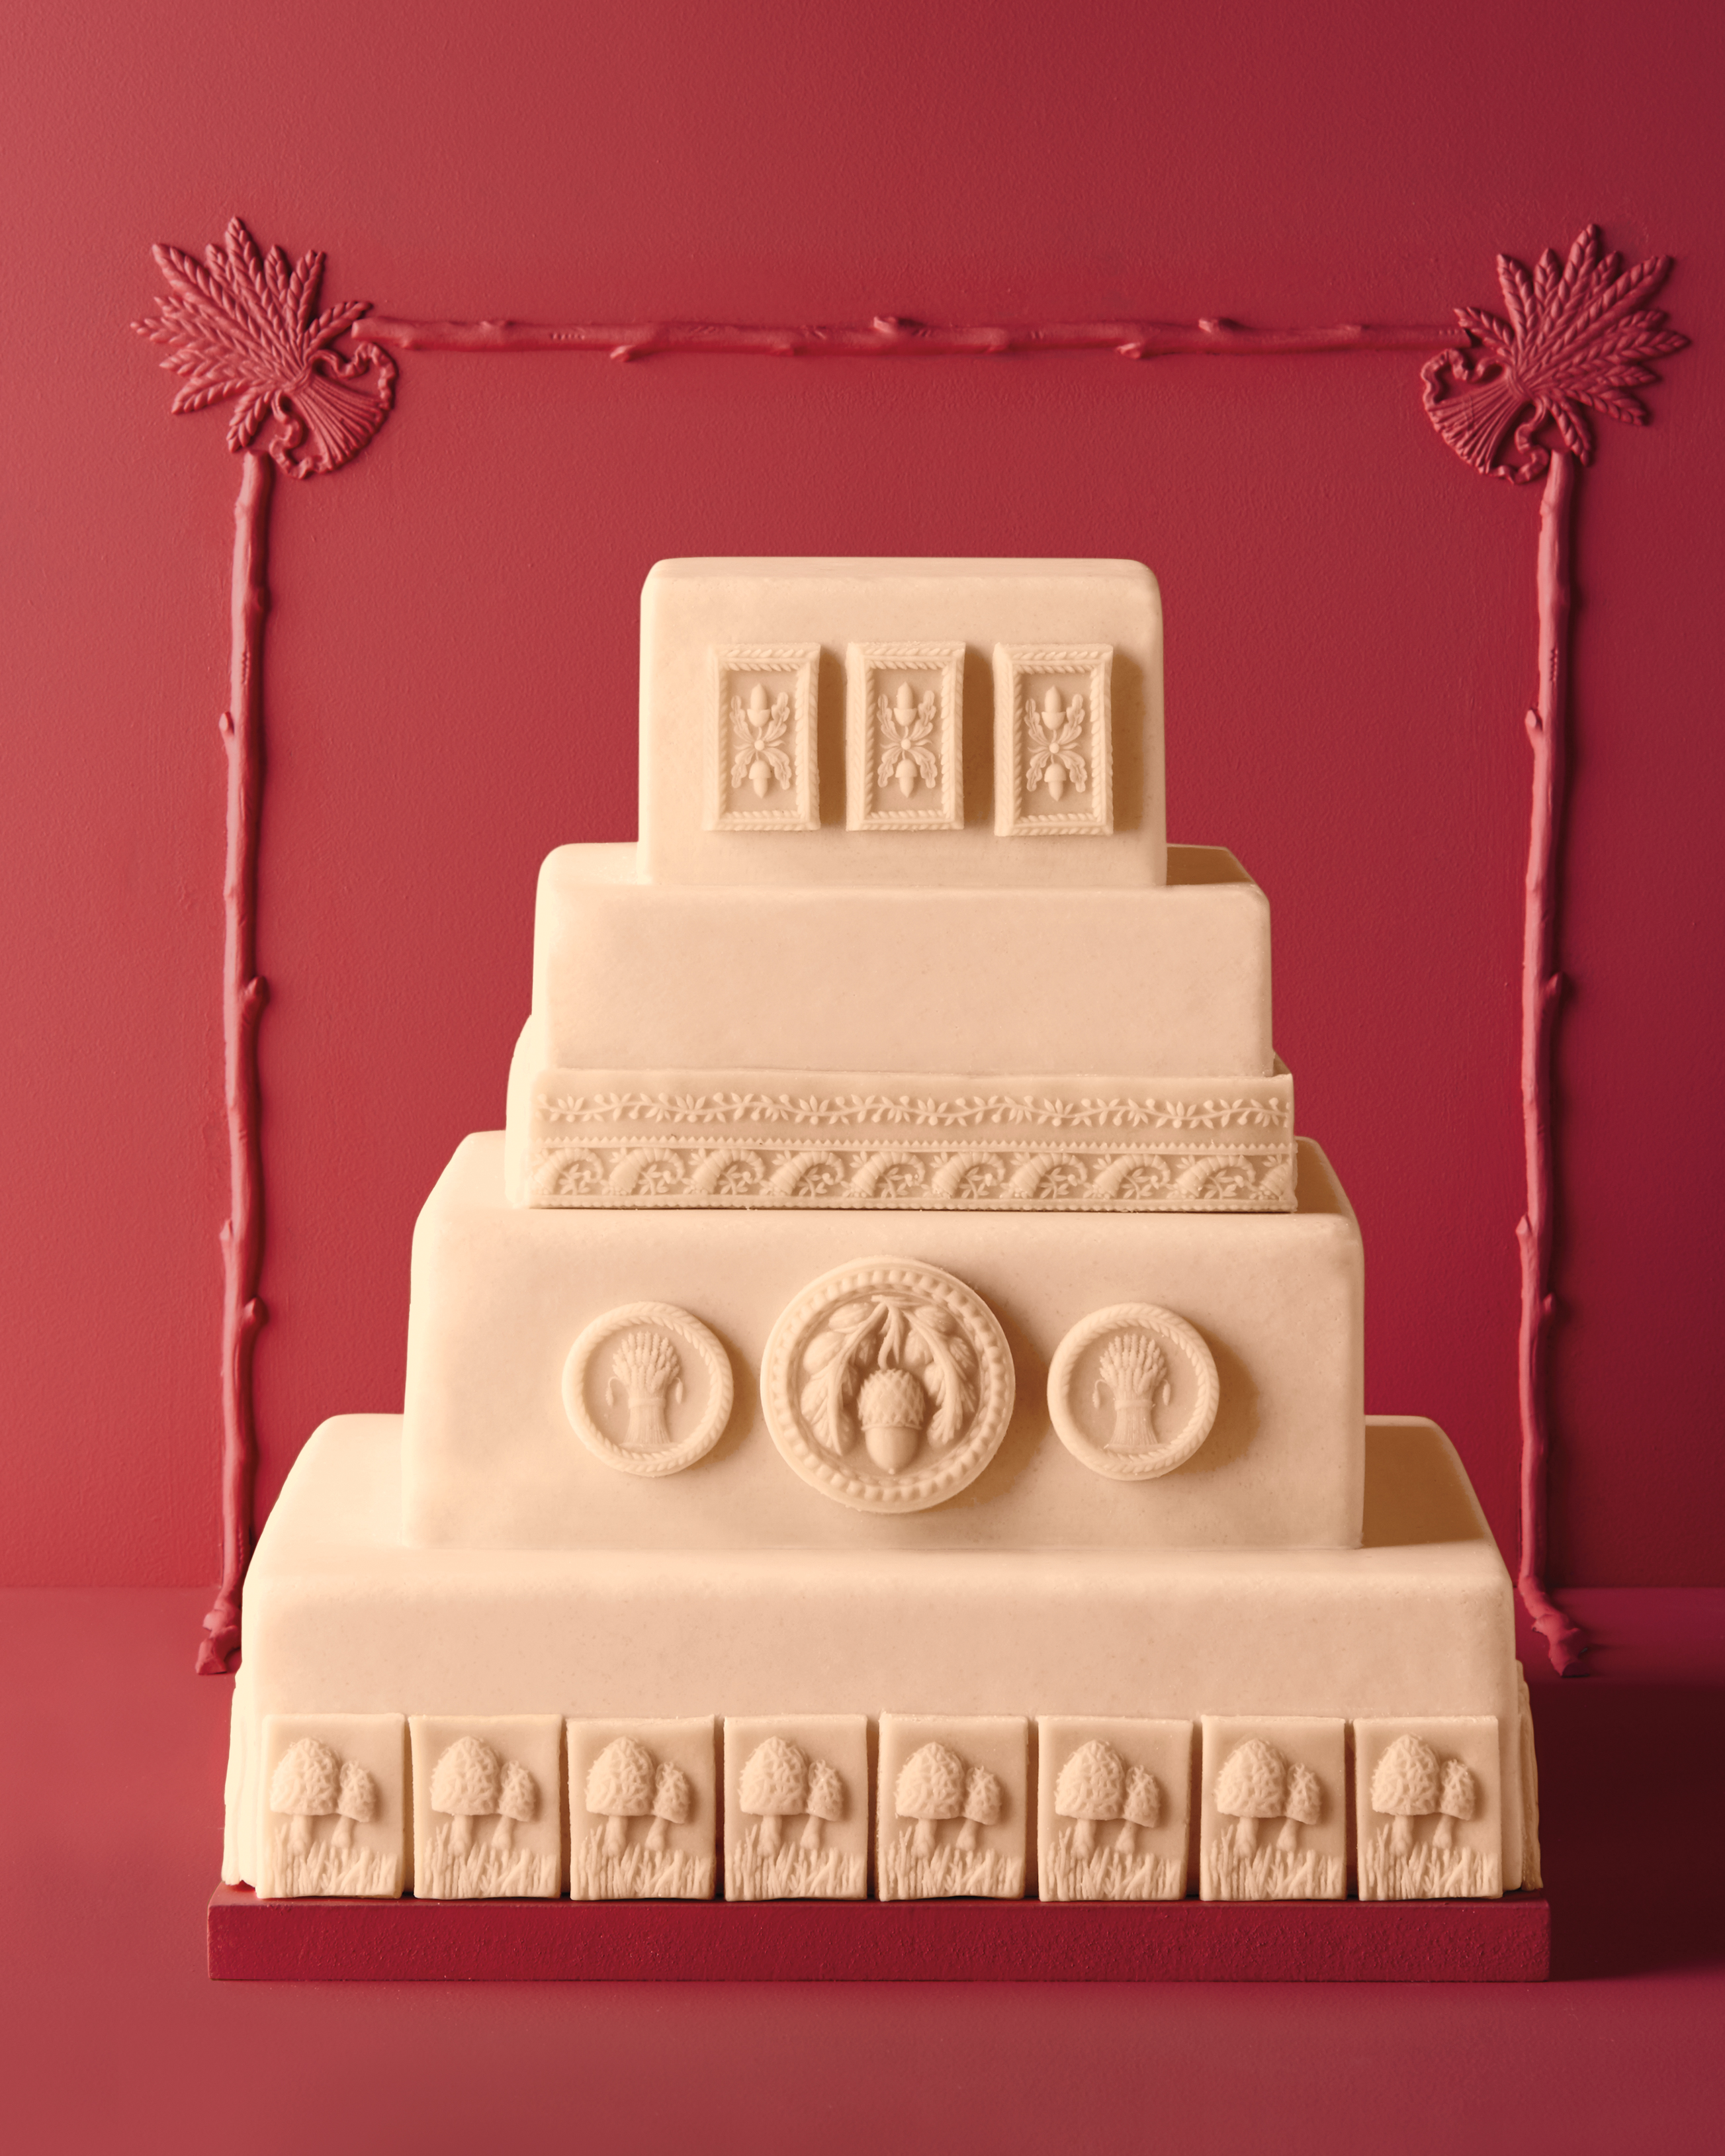 fall-wedding-cake-b-0340-d112493-comp.jpg